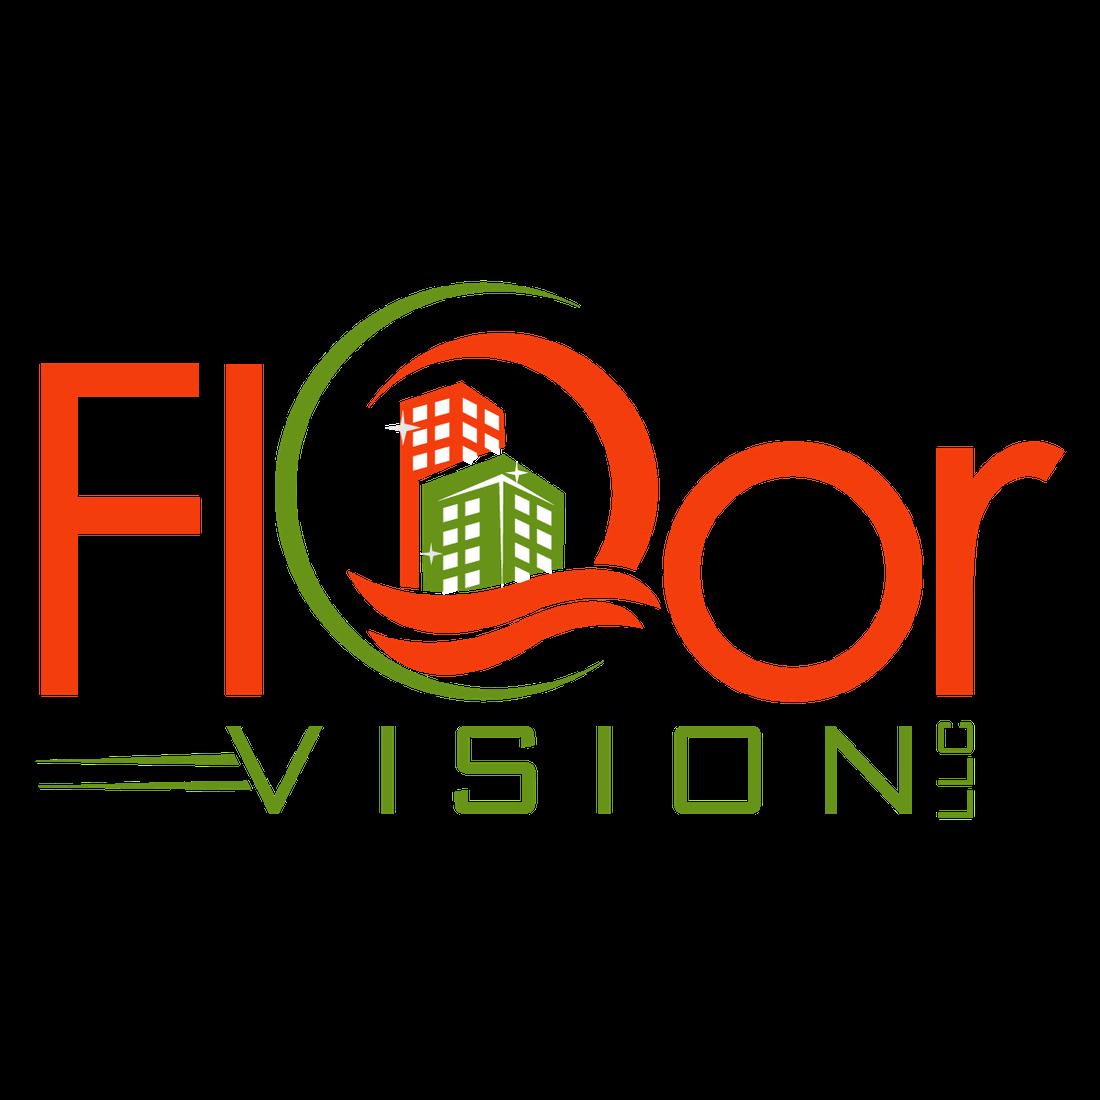 Floor Vision, LLC